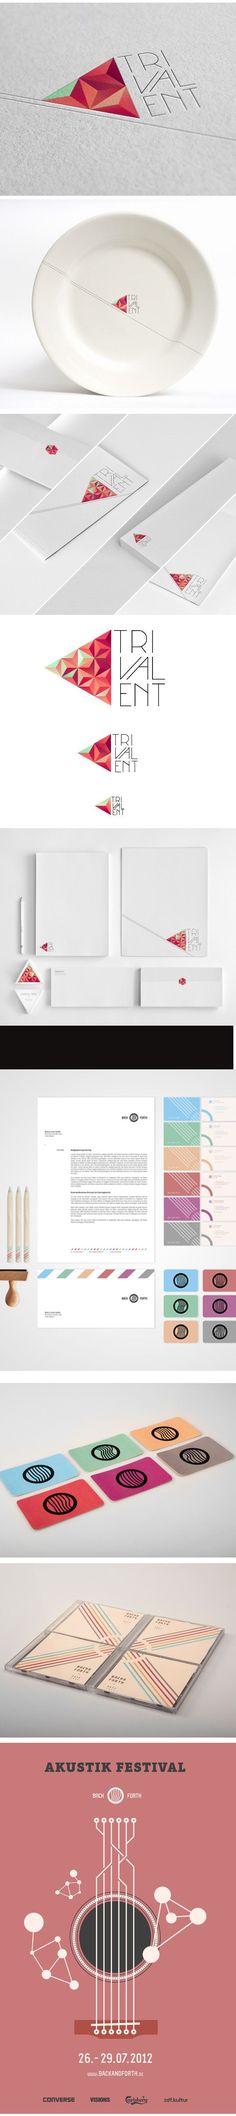 #design #branding #identity: